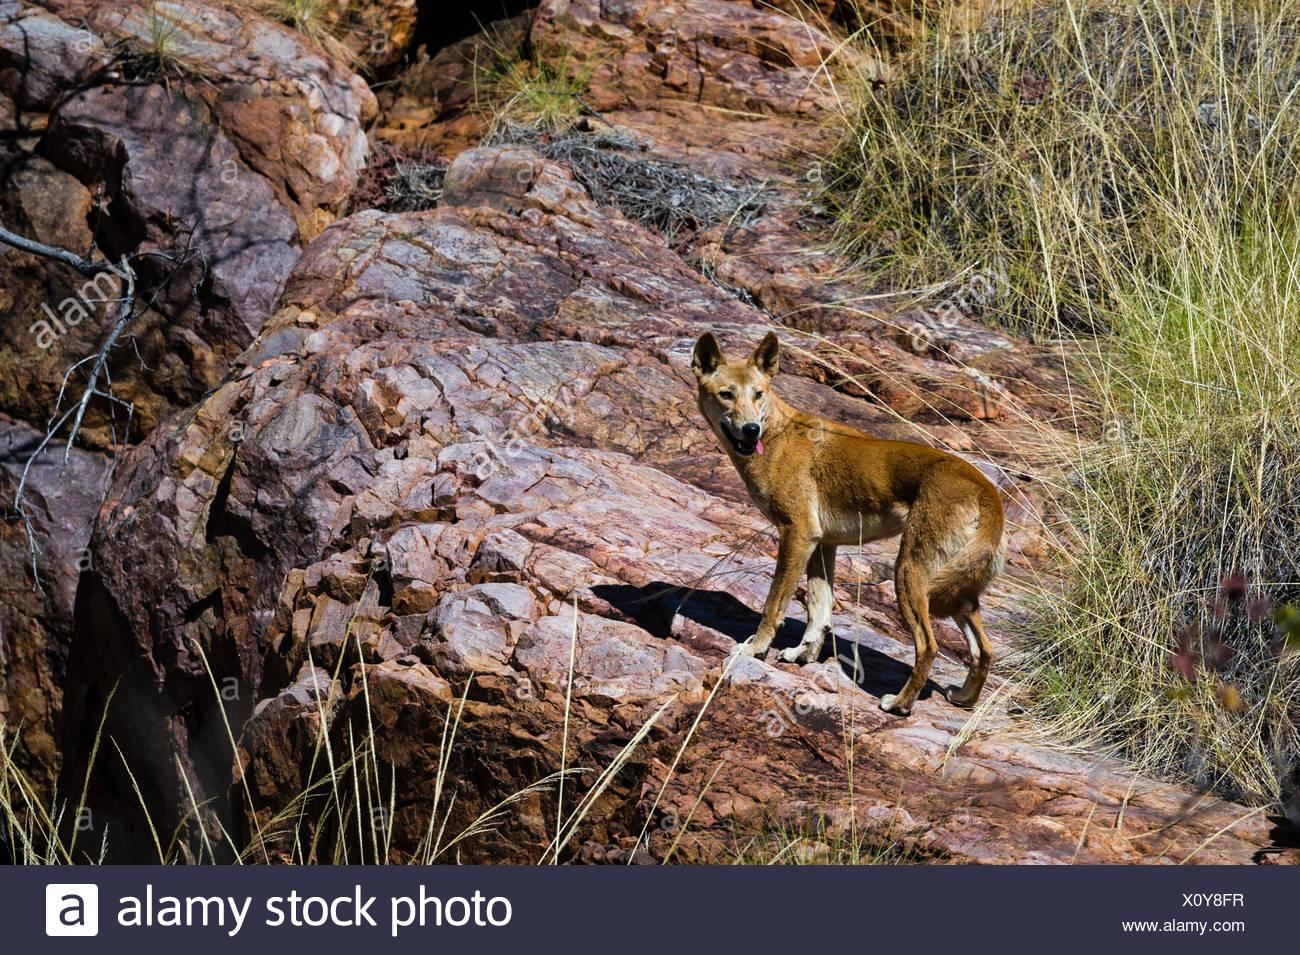 A cautious Dingo on a desert cliff. - Stock Image